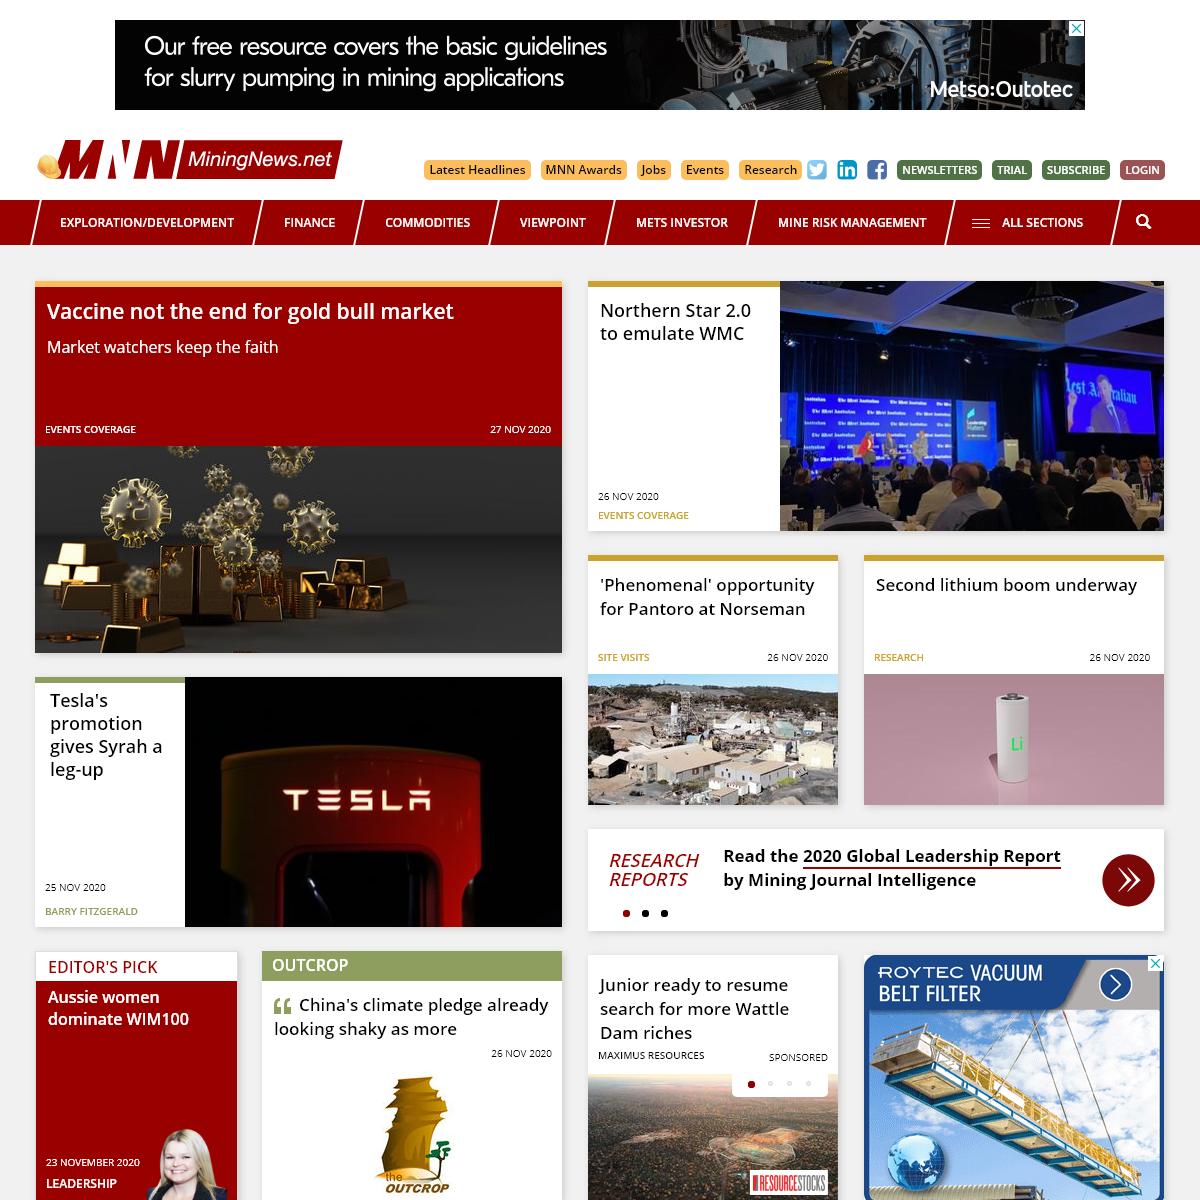 Mining Investment and Finance News- MiningNews.net